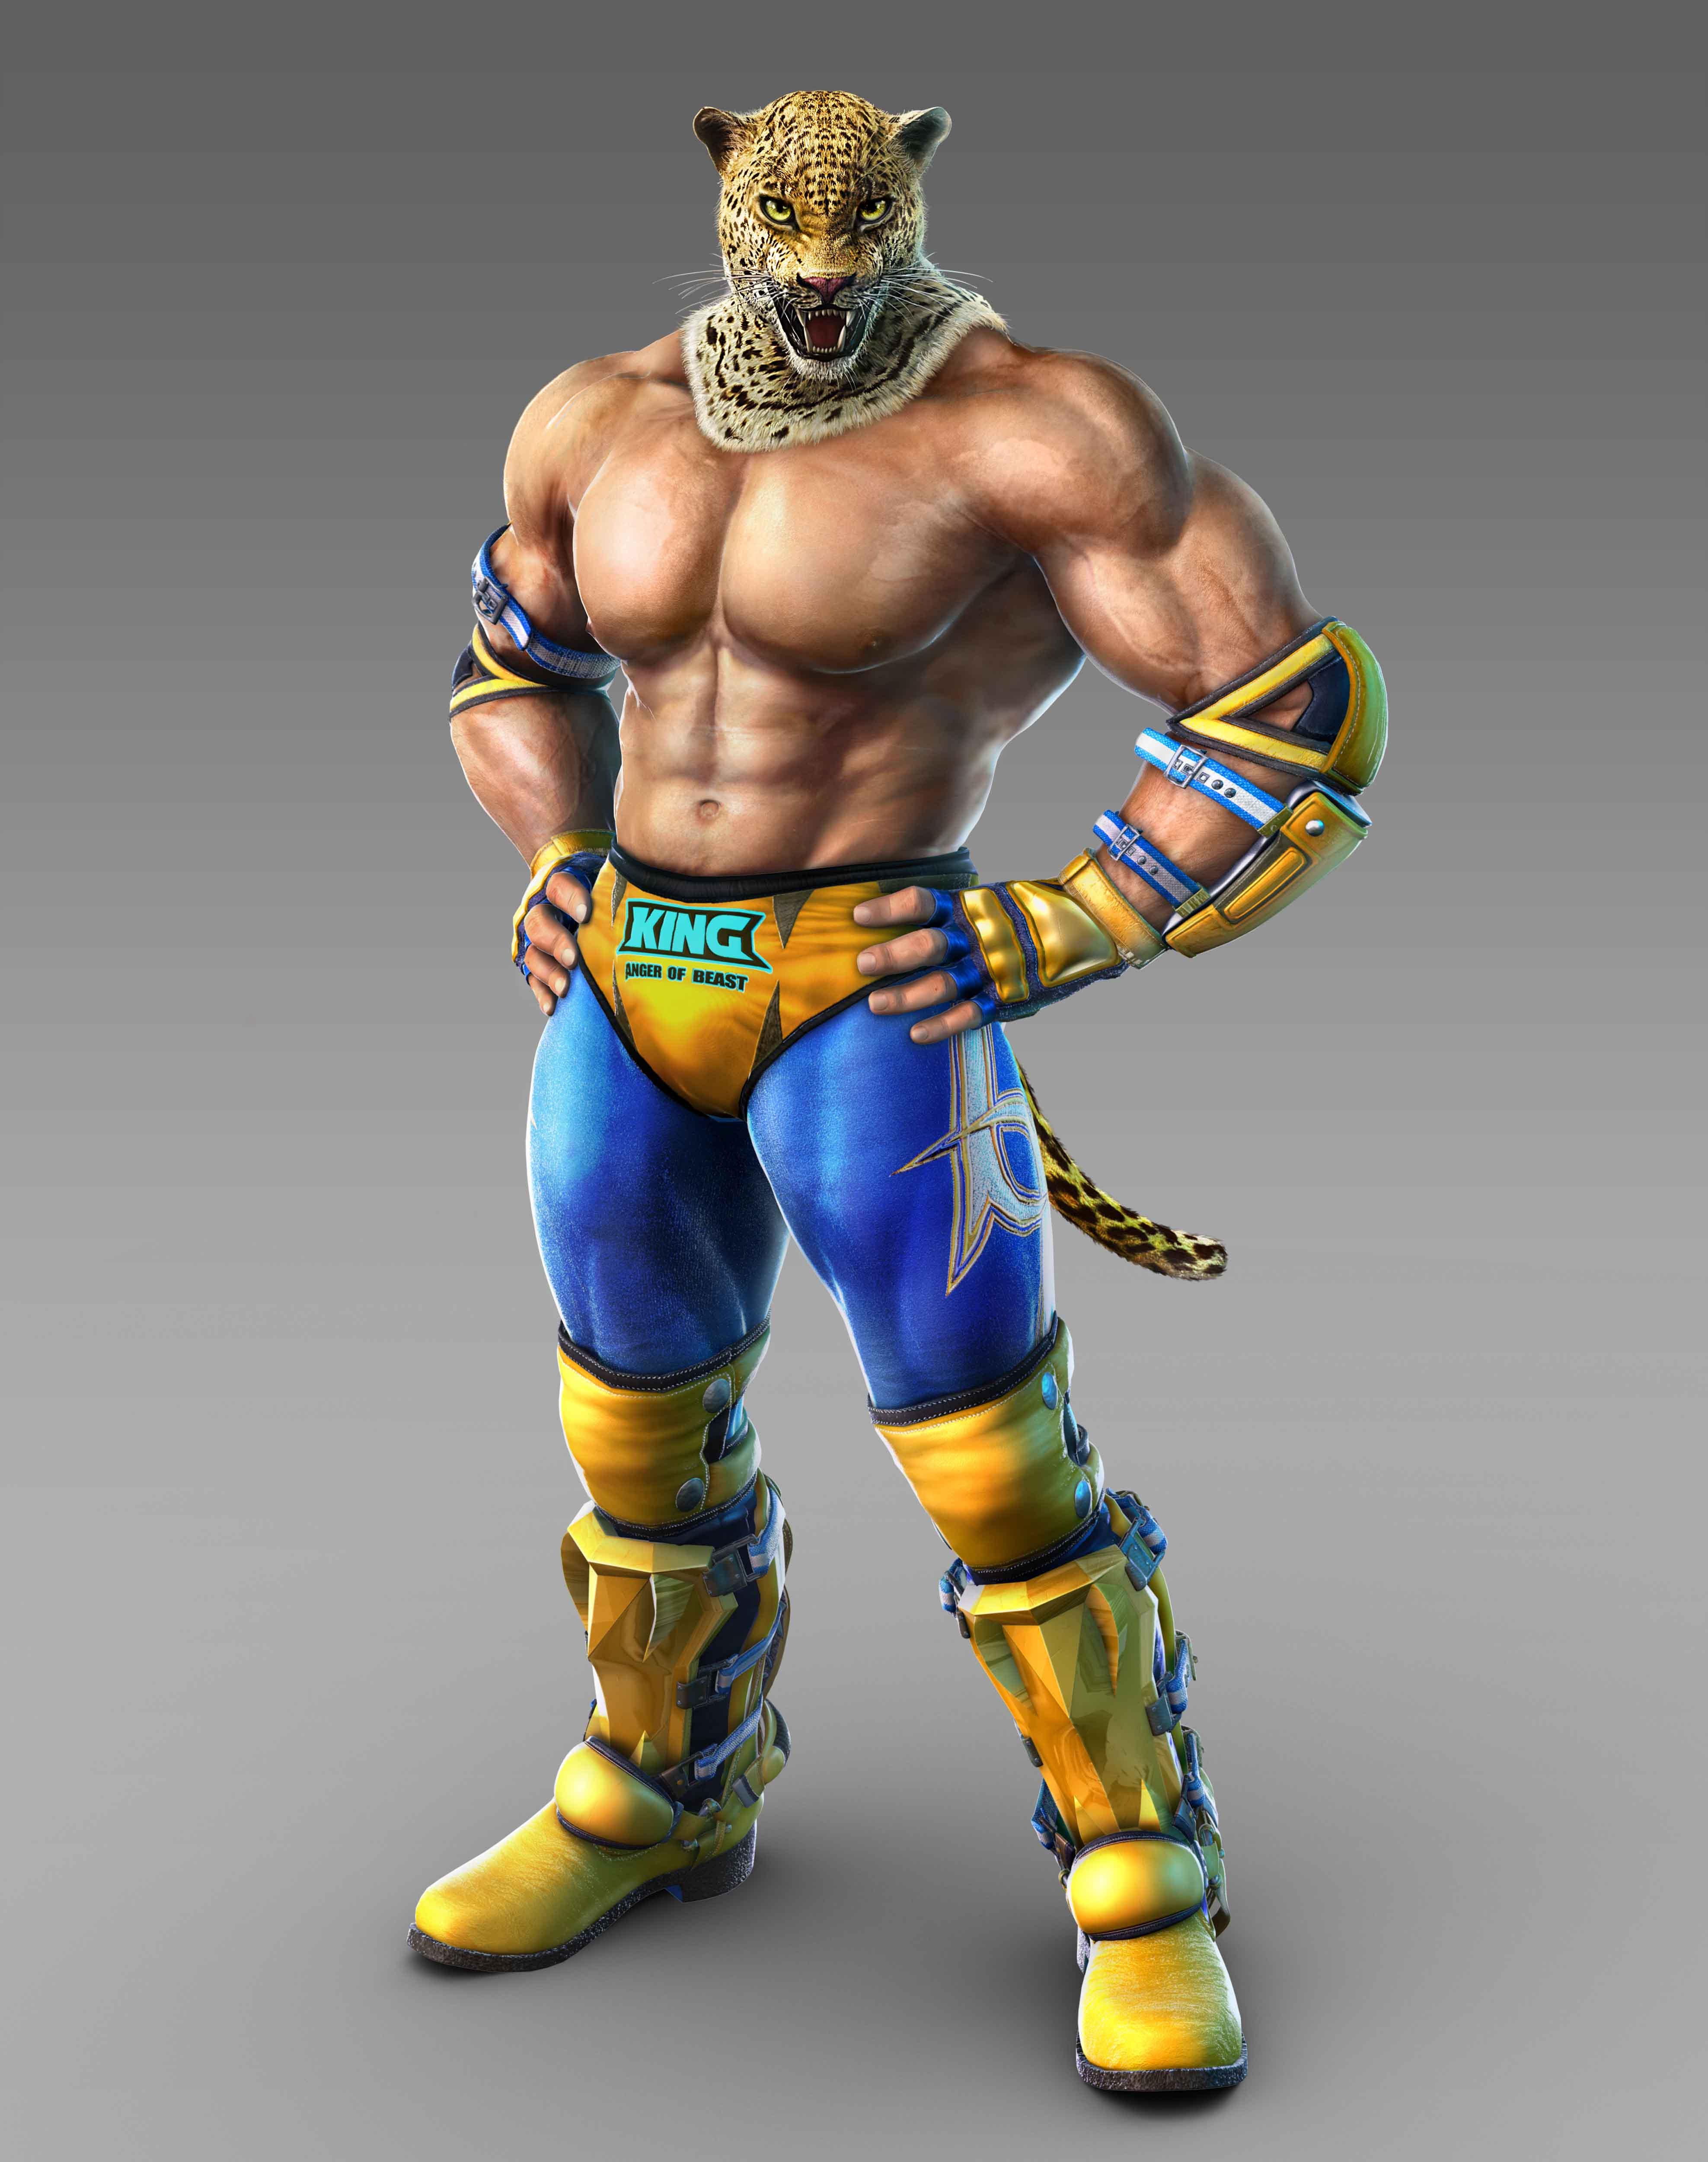 King Ii Tekken 7 3951x5000 Wallpaper Teahub Io